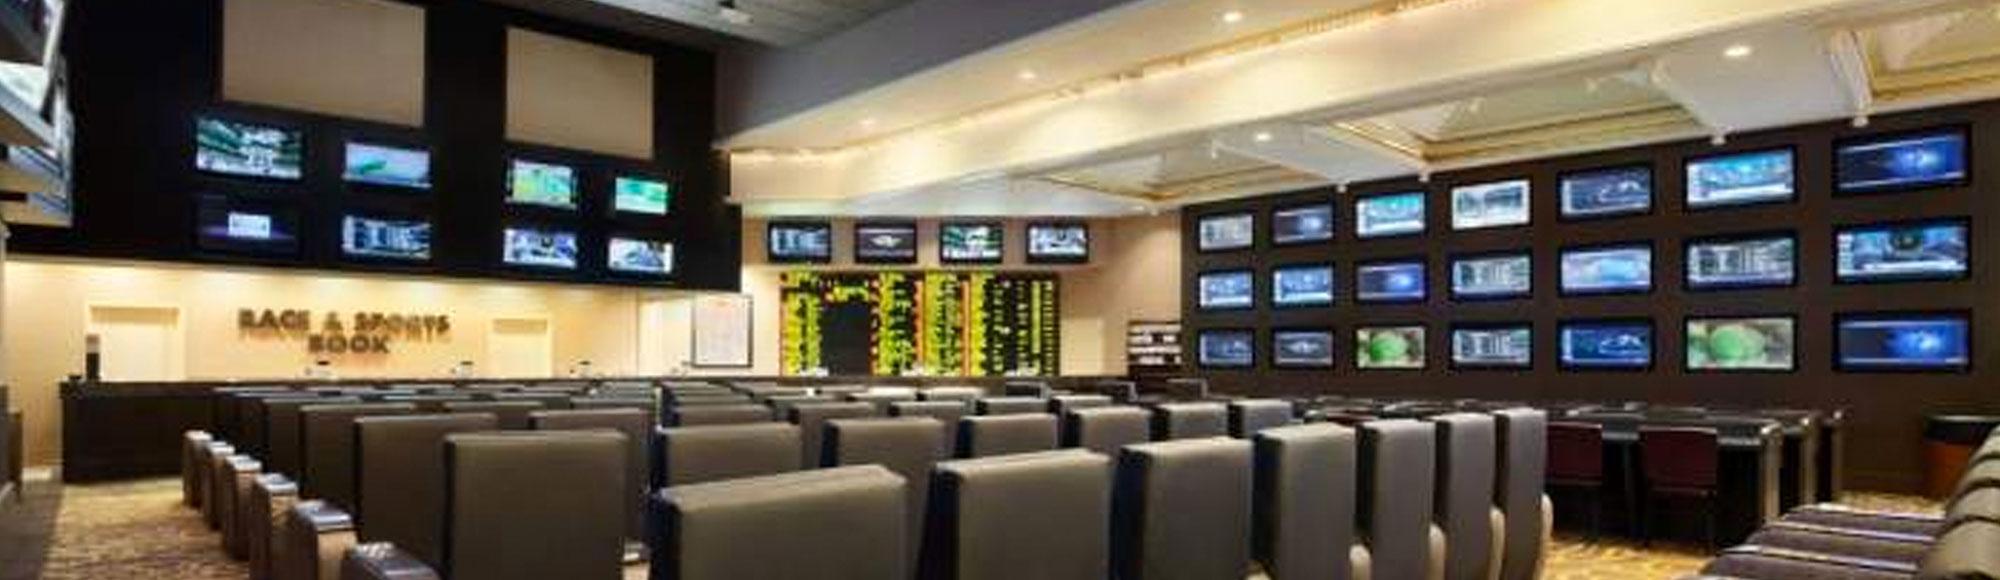 Flamingo sports betting binary options 0 1 netting